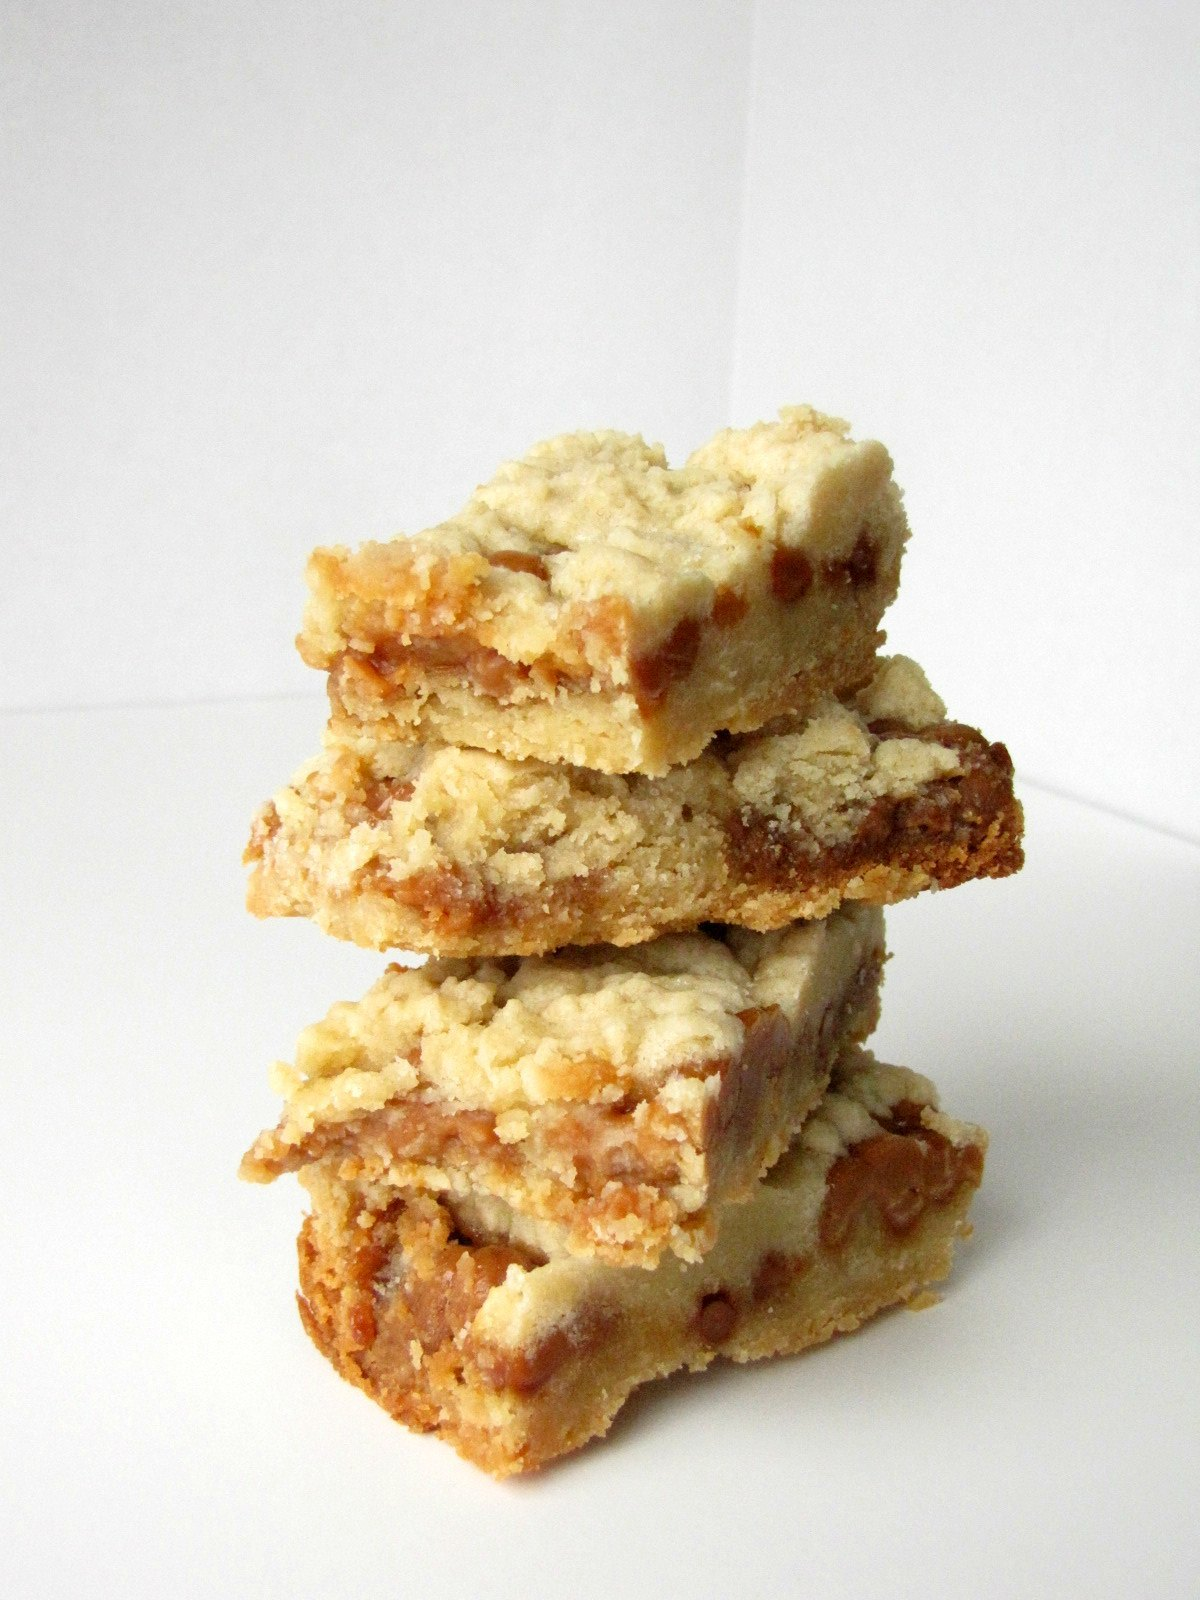 Slow Cooker Caramel Crumb Cookie Bars | Slow Cooker Desserts